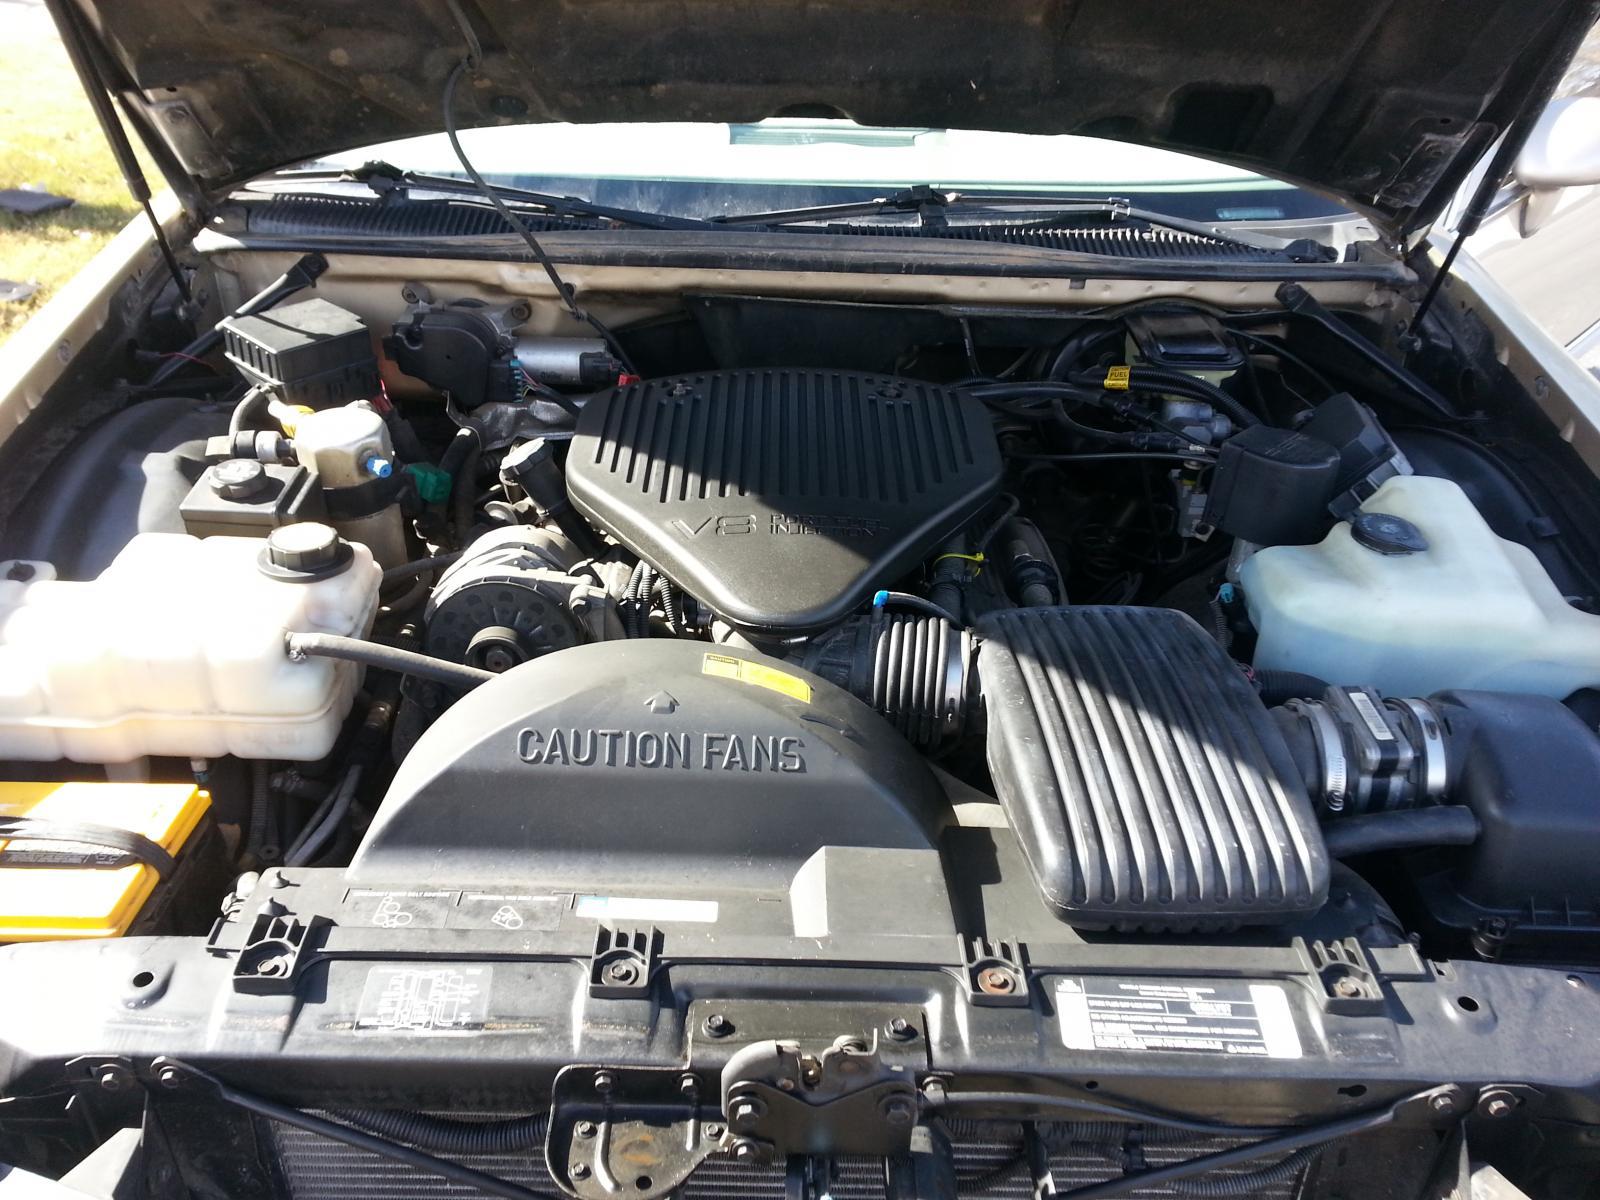 94 Cadillac Fleetwood Brougham SALE/TRADE